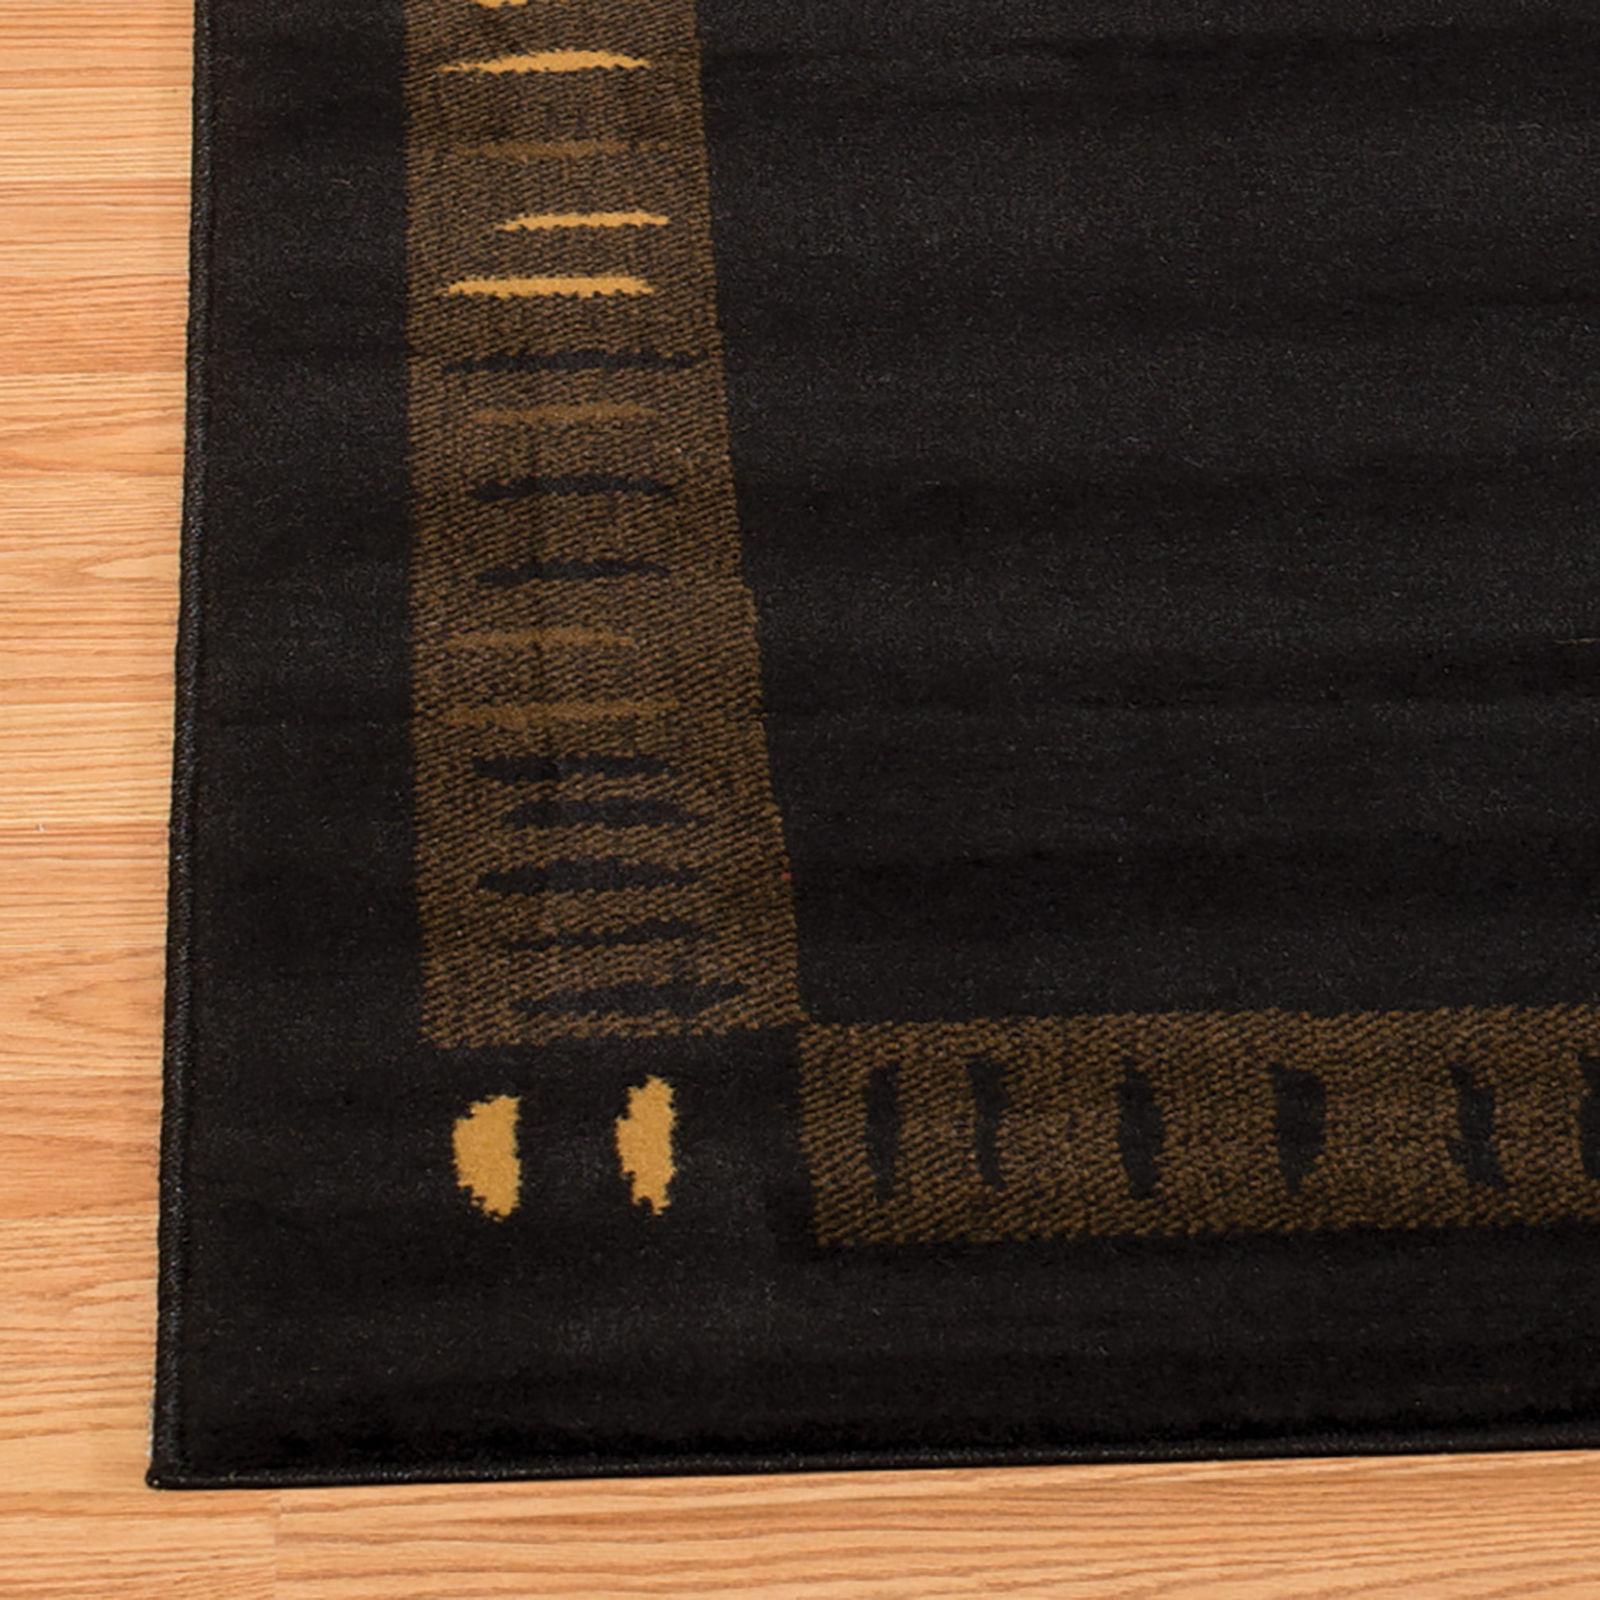 United Weavers China Garden Vanguard Black Area Rug 5'3'' x 7'2''